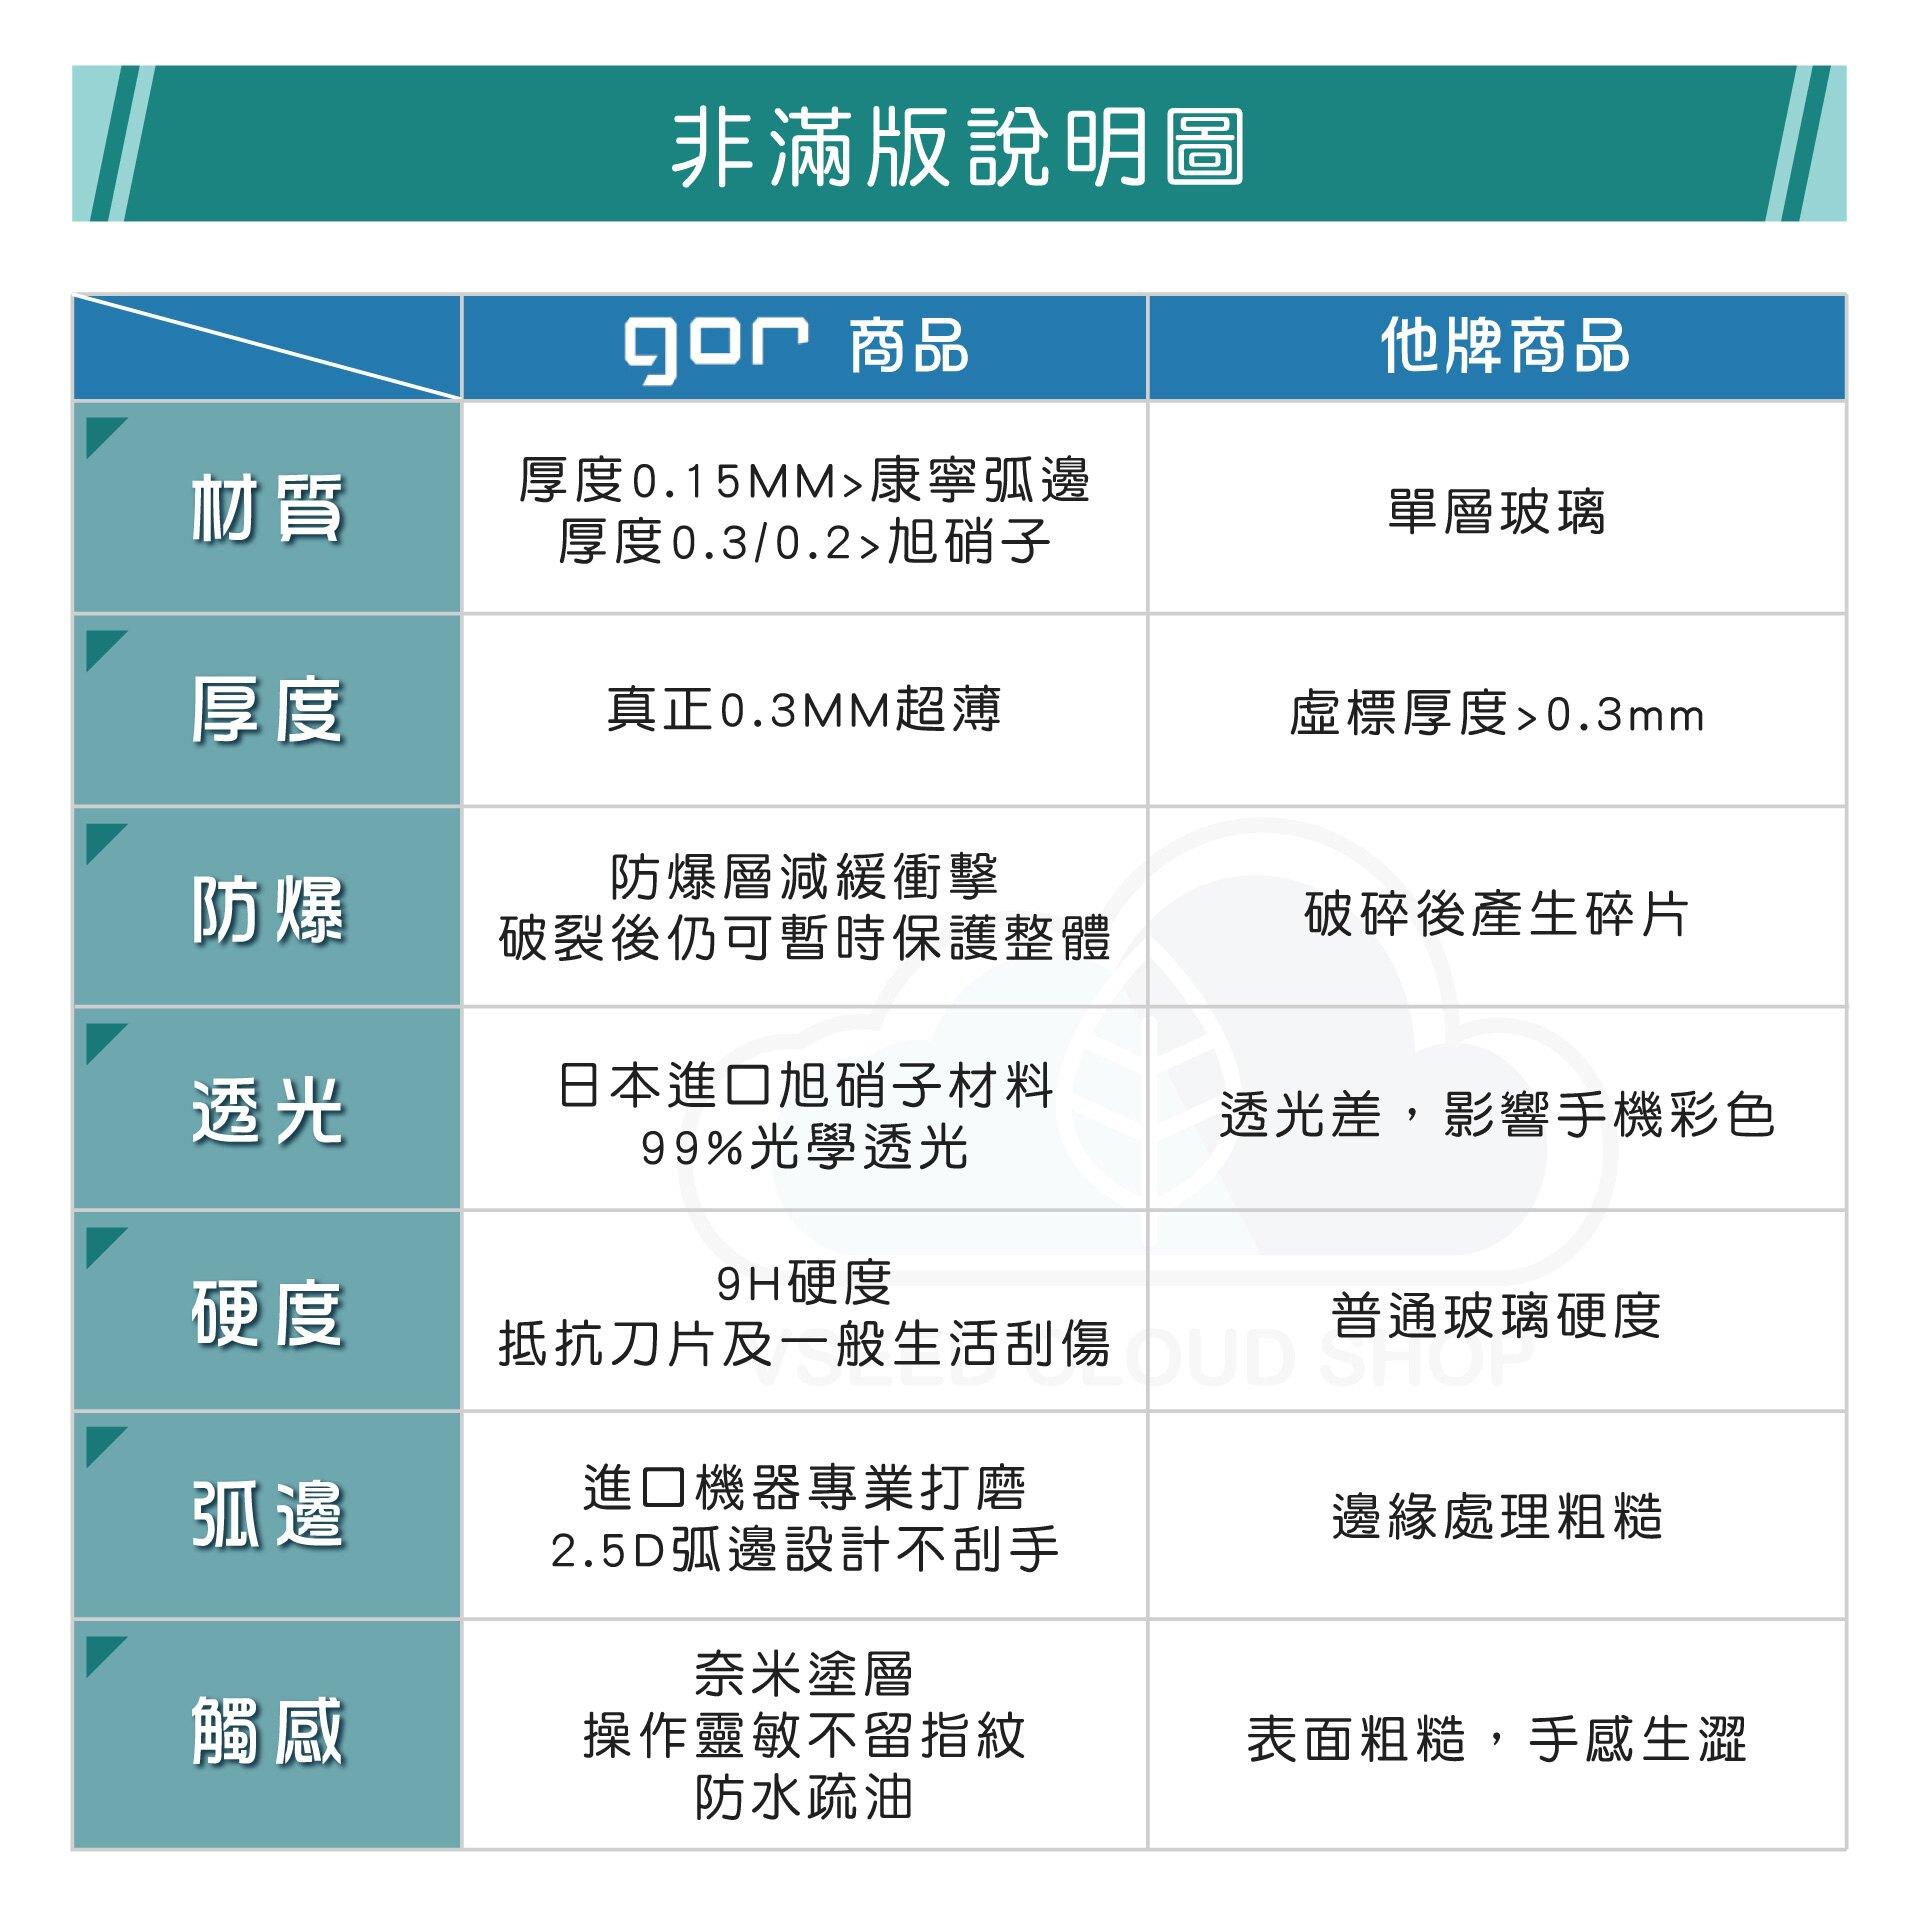 GOR 9H 三星 Samsung Galaxy J7 Prime 鋼化 玻璃 保護貼 全透明非滿版 兩片裝【全館滿299免運費】